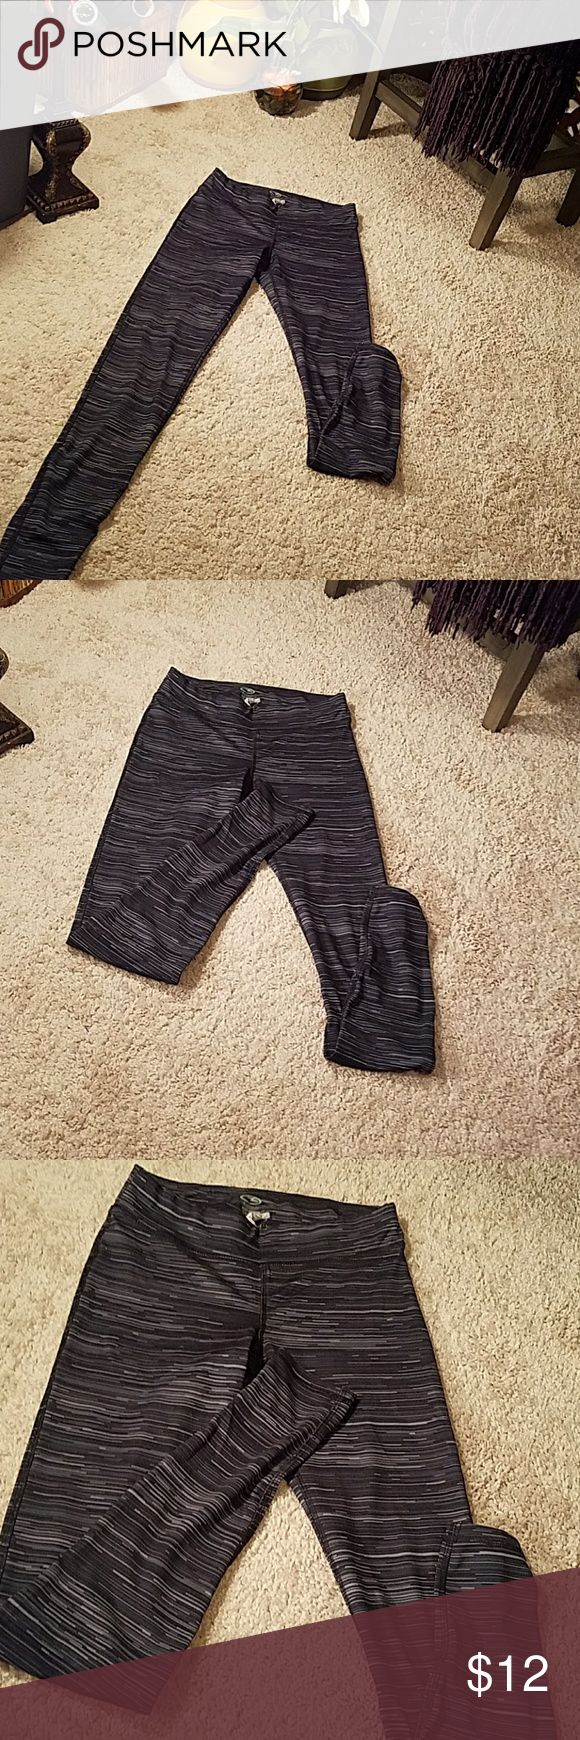 Champion Duo Dry XS/TP.  Gray/ Black athletic pant Champion Duo Dry XS/TP.  Gray and Black . In great condition. Champion  Pants